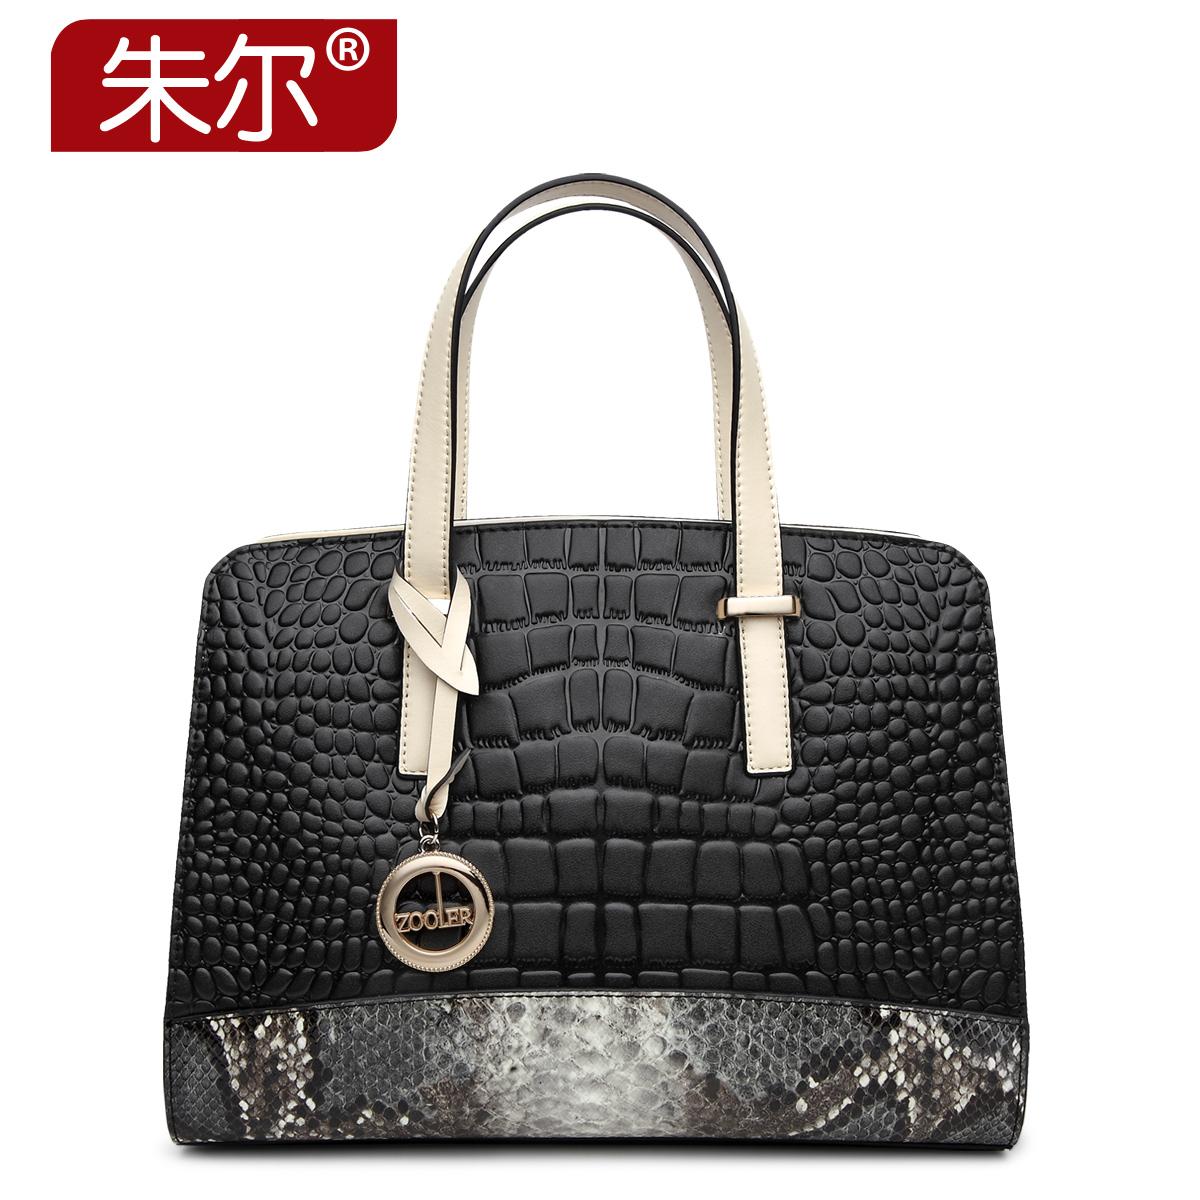 2015 womens cowhide handbag elegant womens bags fashion one shoulder handbag female bag leather<br><br>Aliexpress